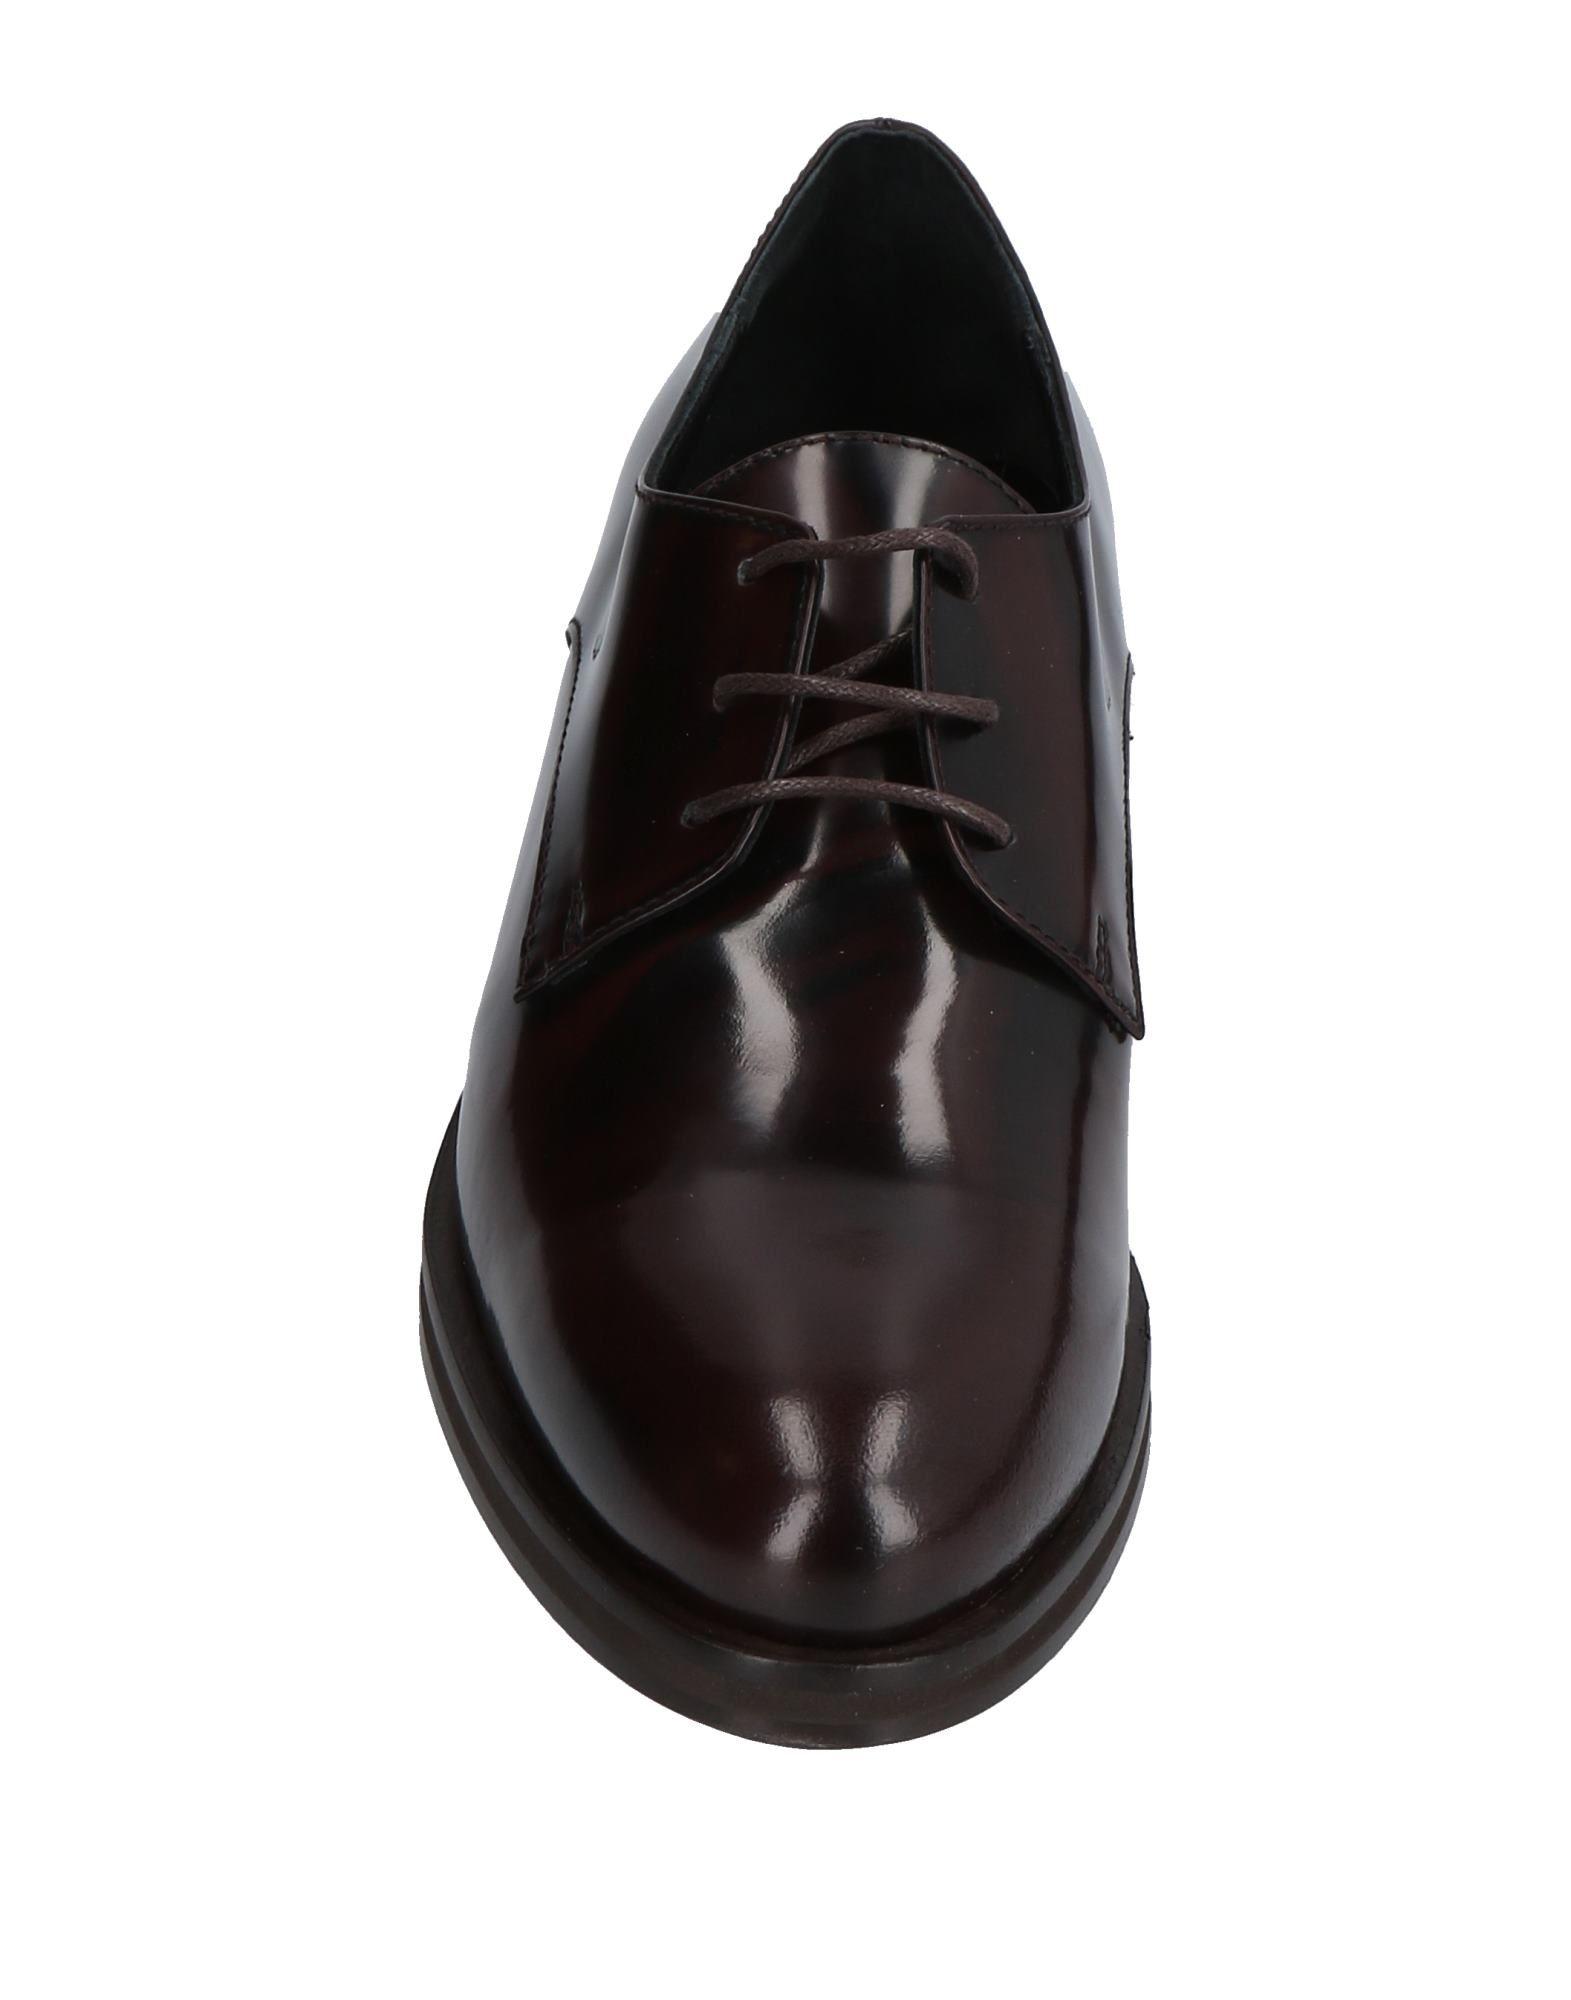 Stilvolle billige Schnürschuhe Schuhe Giancarlo Paoli Schnürschuhe billige Damen  11477205SP 93e0b0